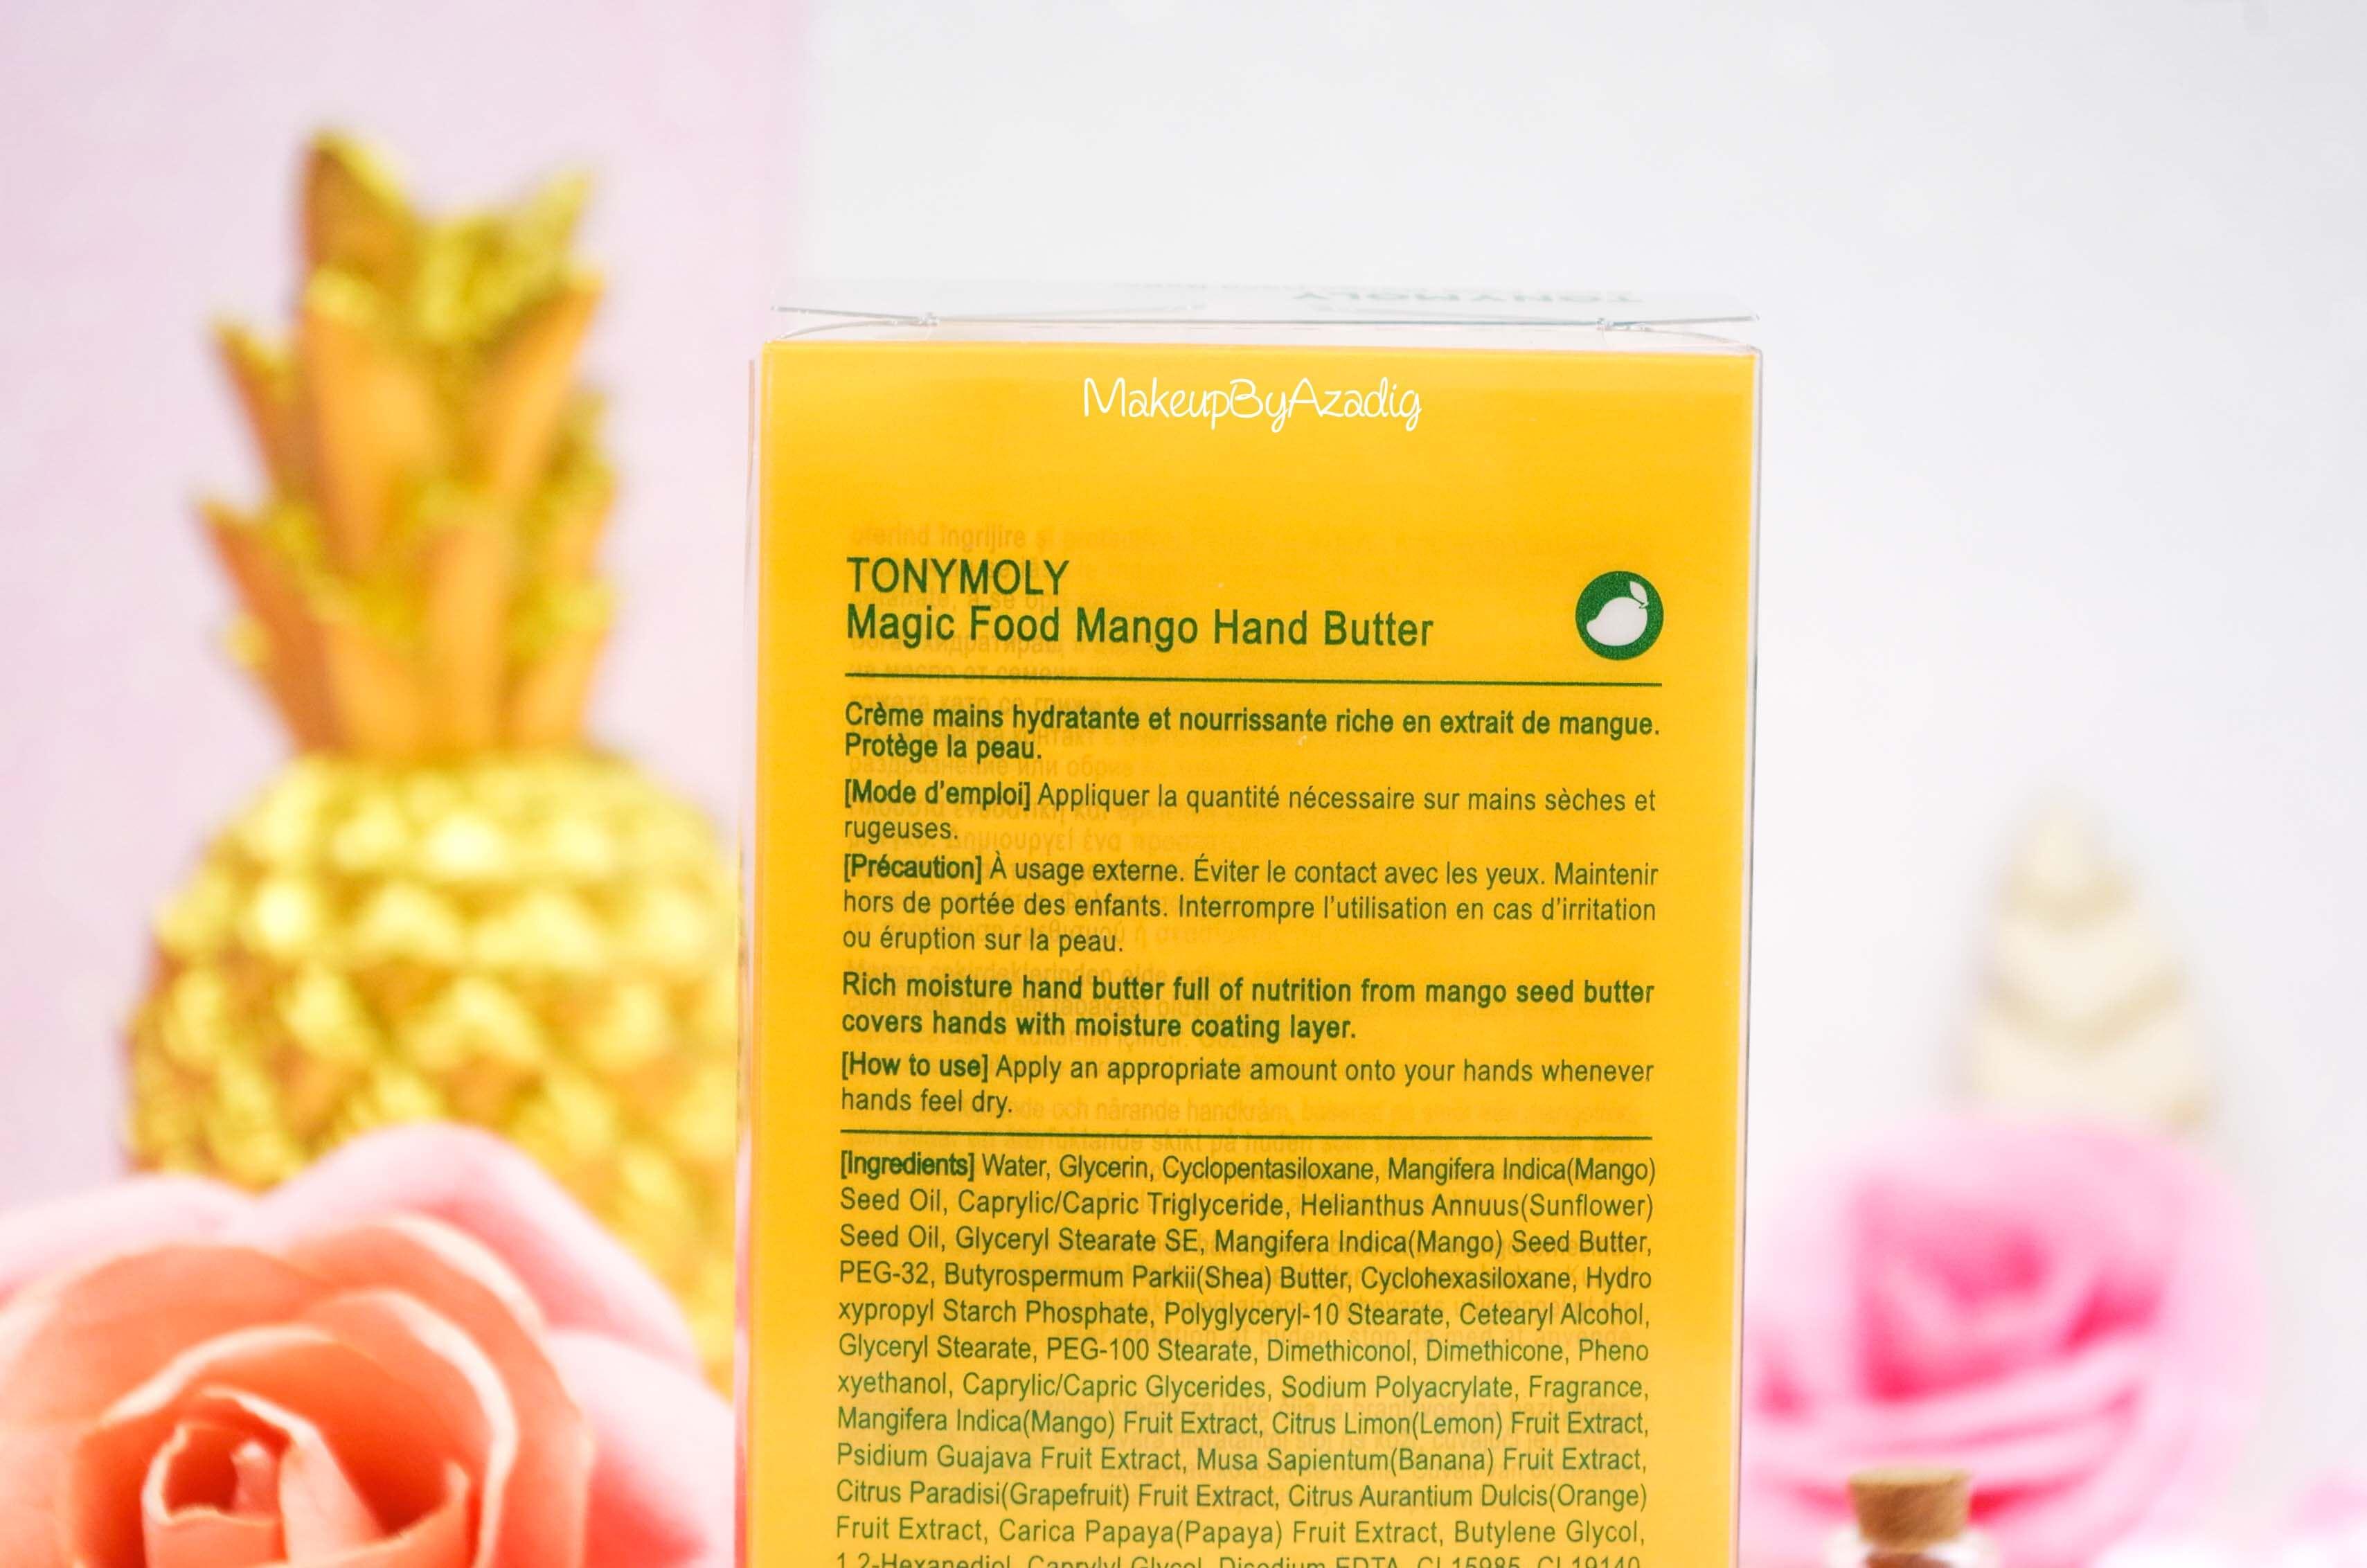 creme-mains-mango-hand-butter-tonymoly-sephora-france-cocooning-revue-avis-prix-makeupbyazadig-influencer-ingredients